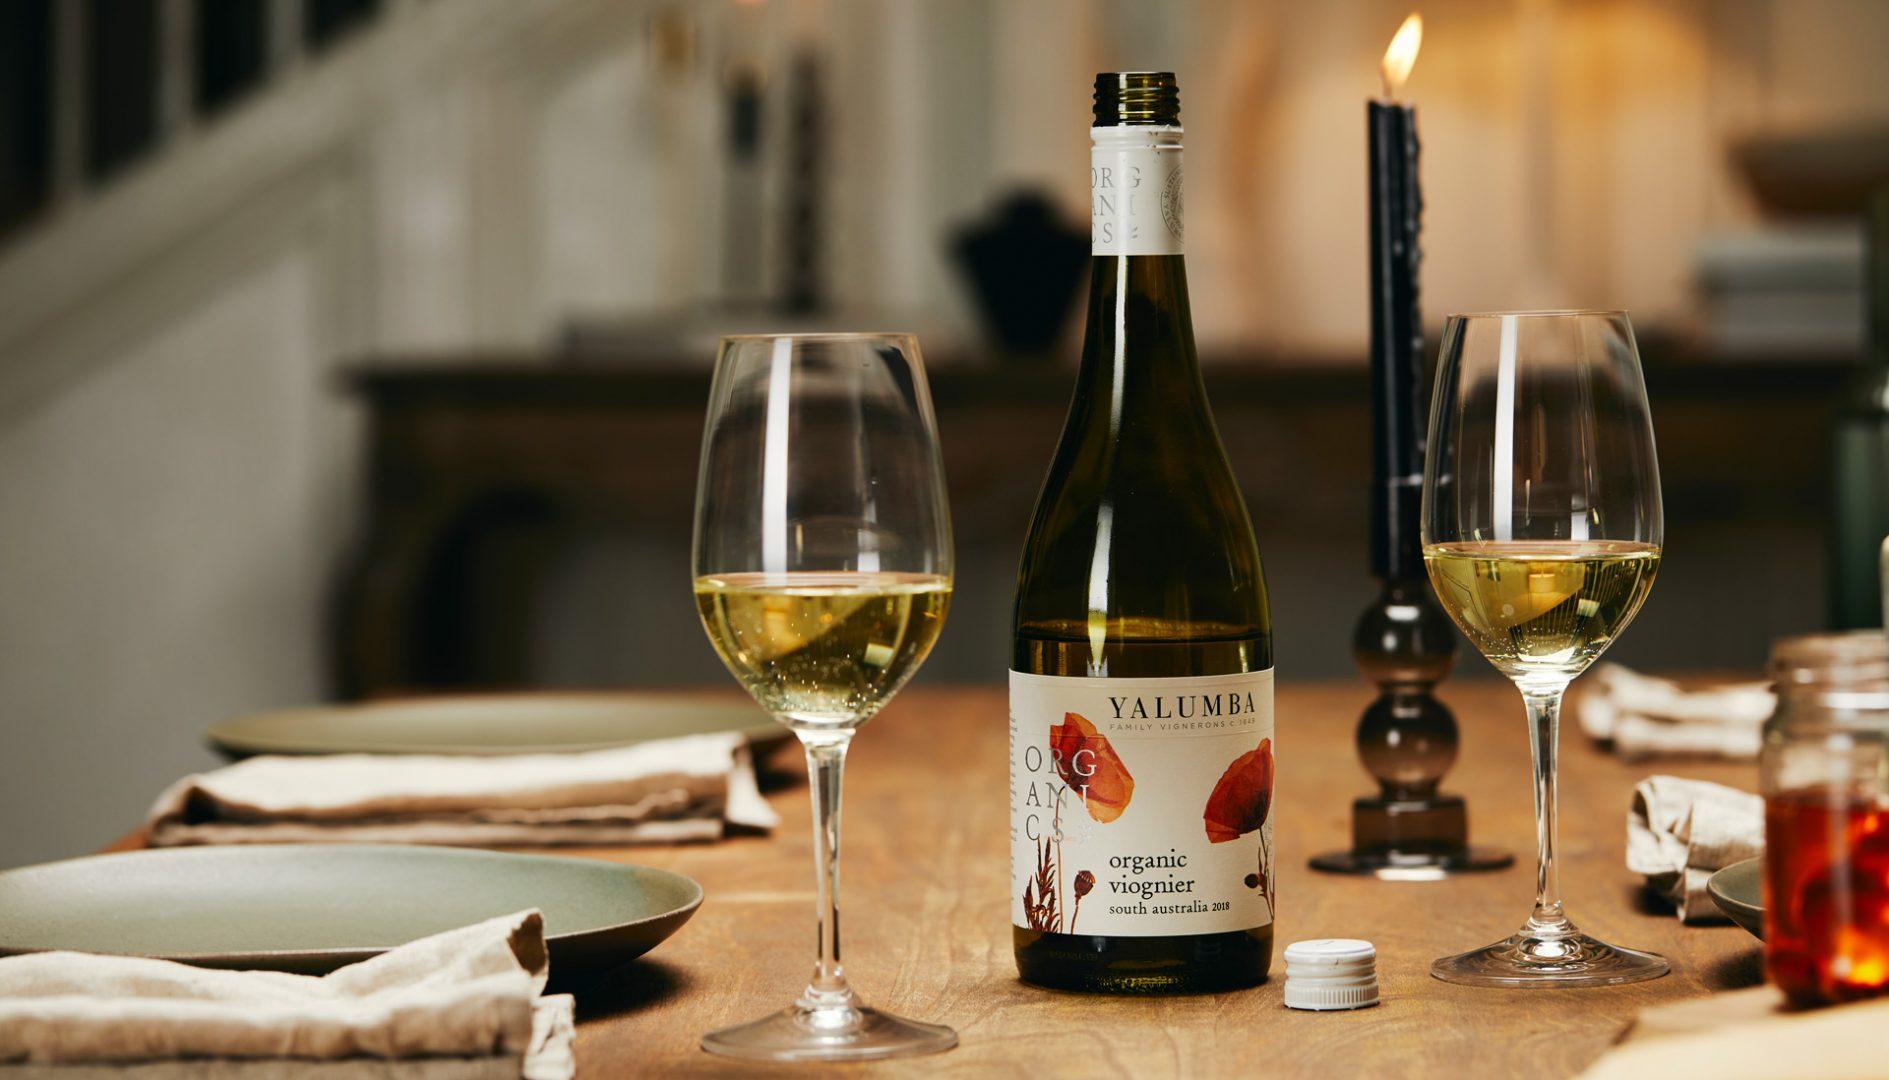 m2-viognier-wine